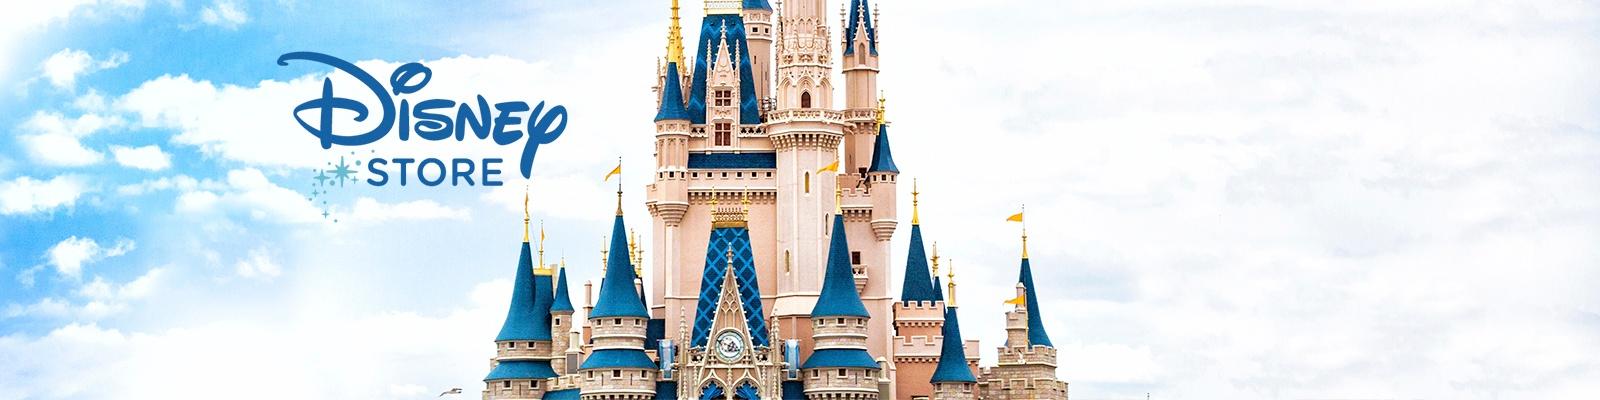 Disney estrategia digital ventas.jpg